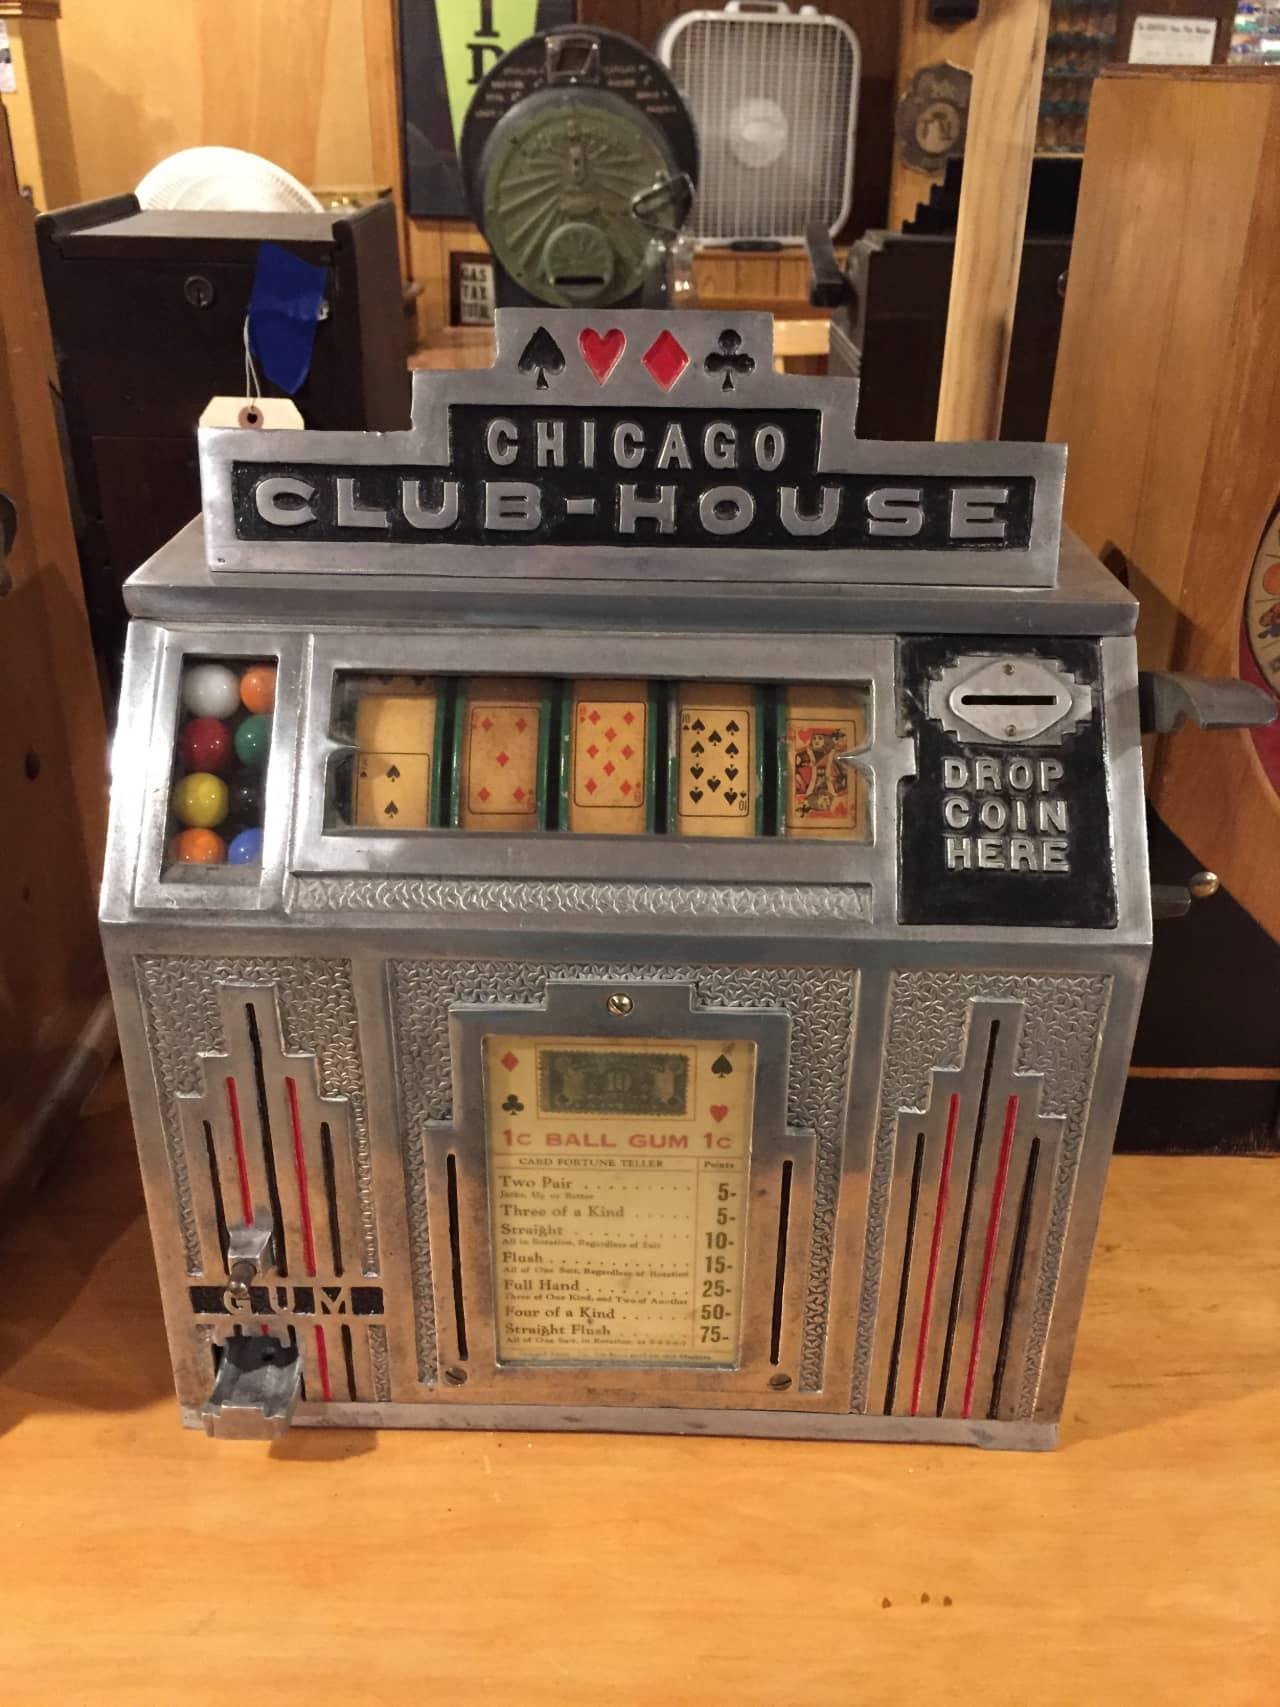 Daval Chicago Club House